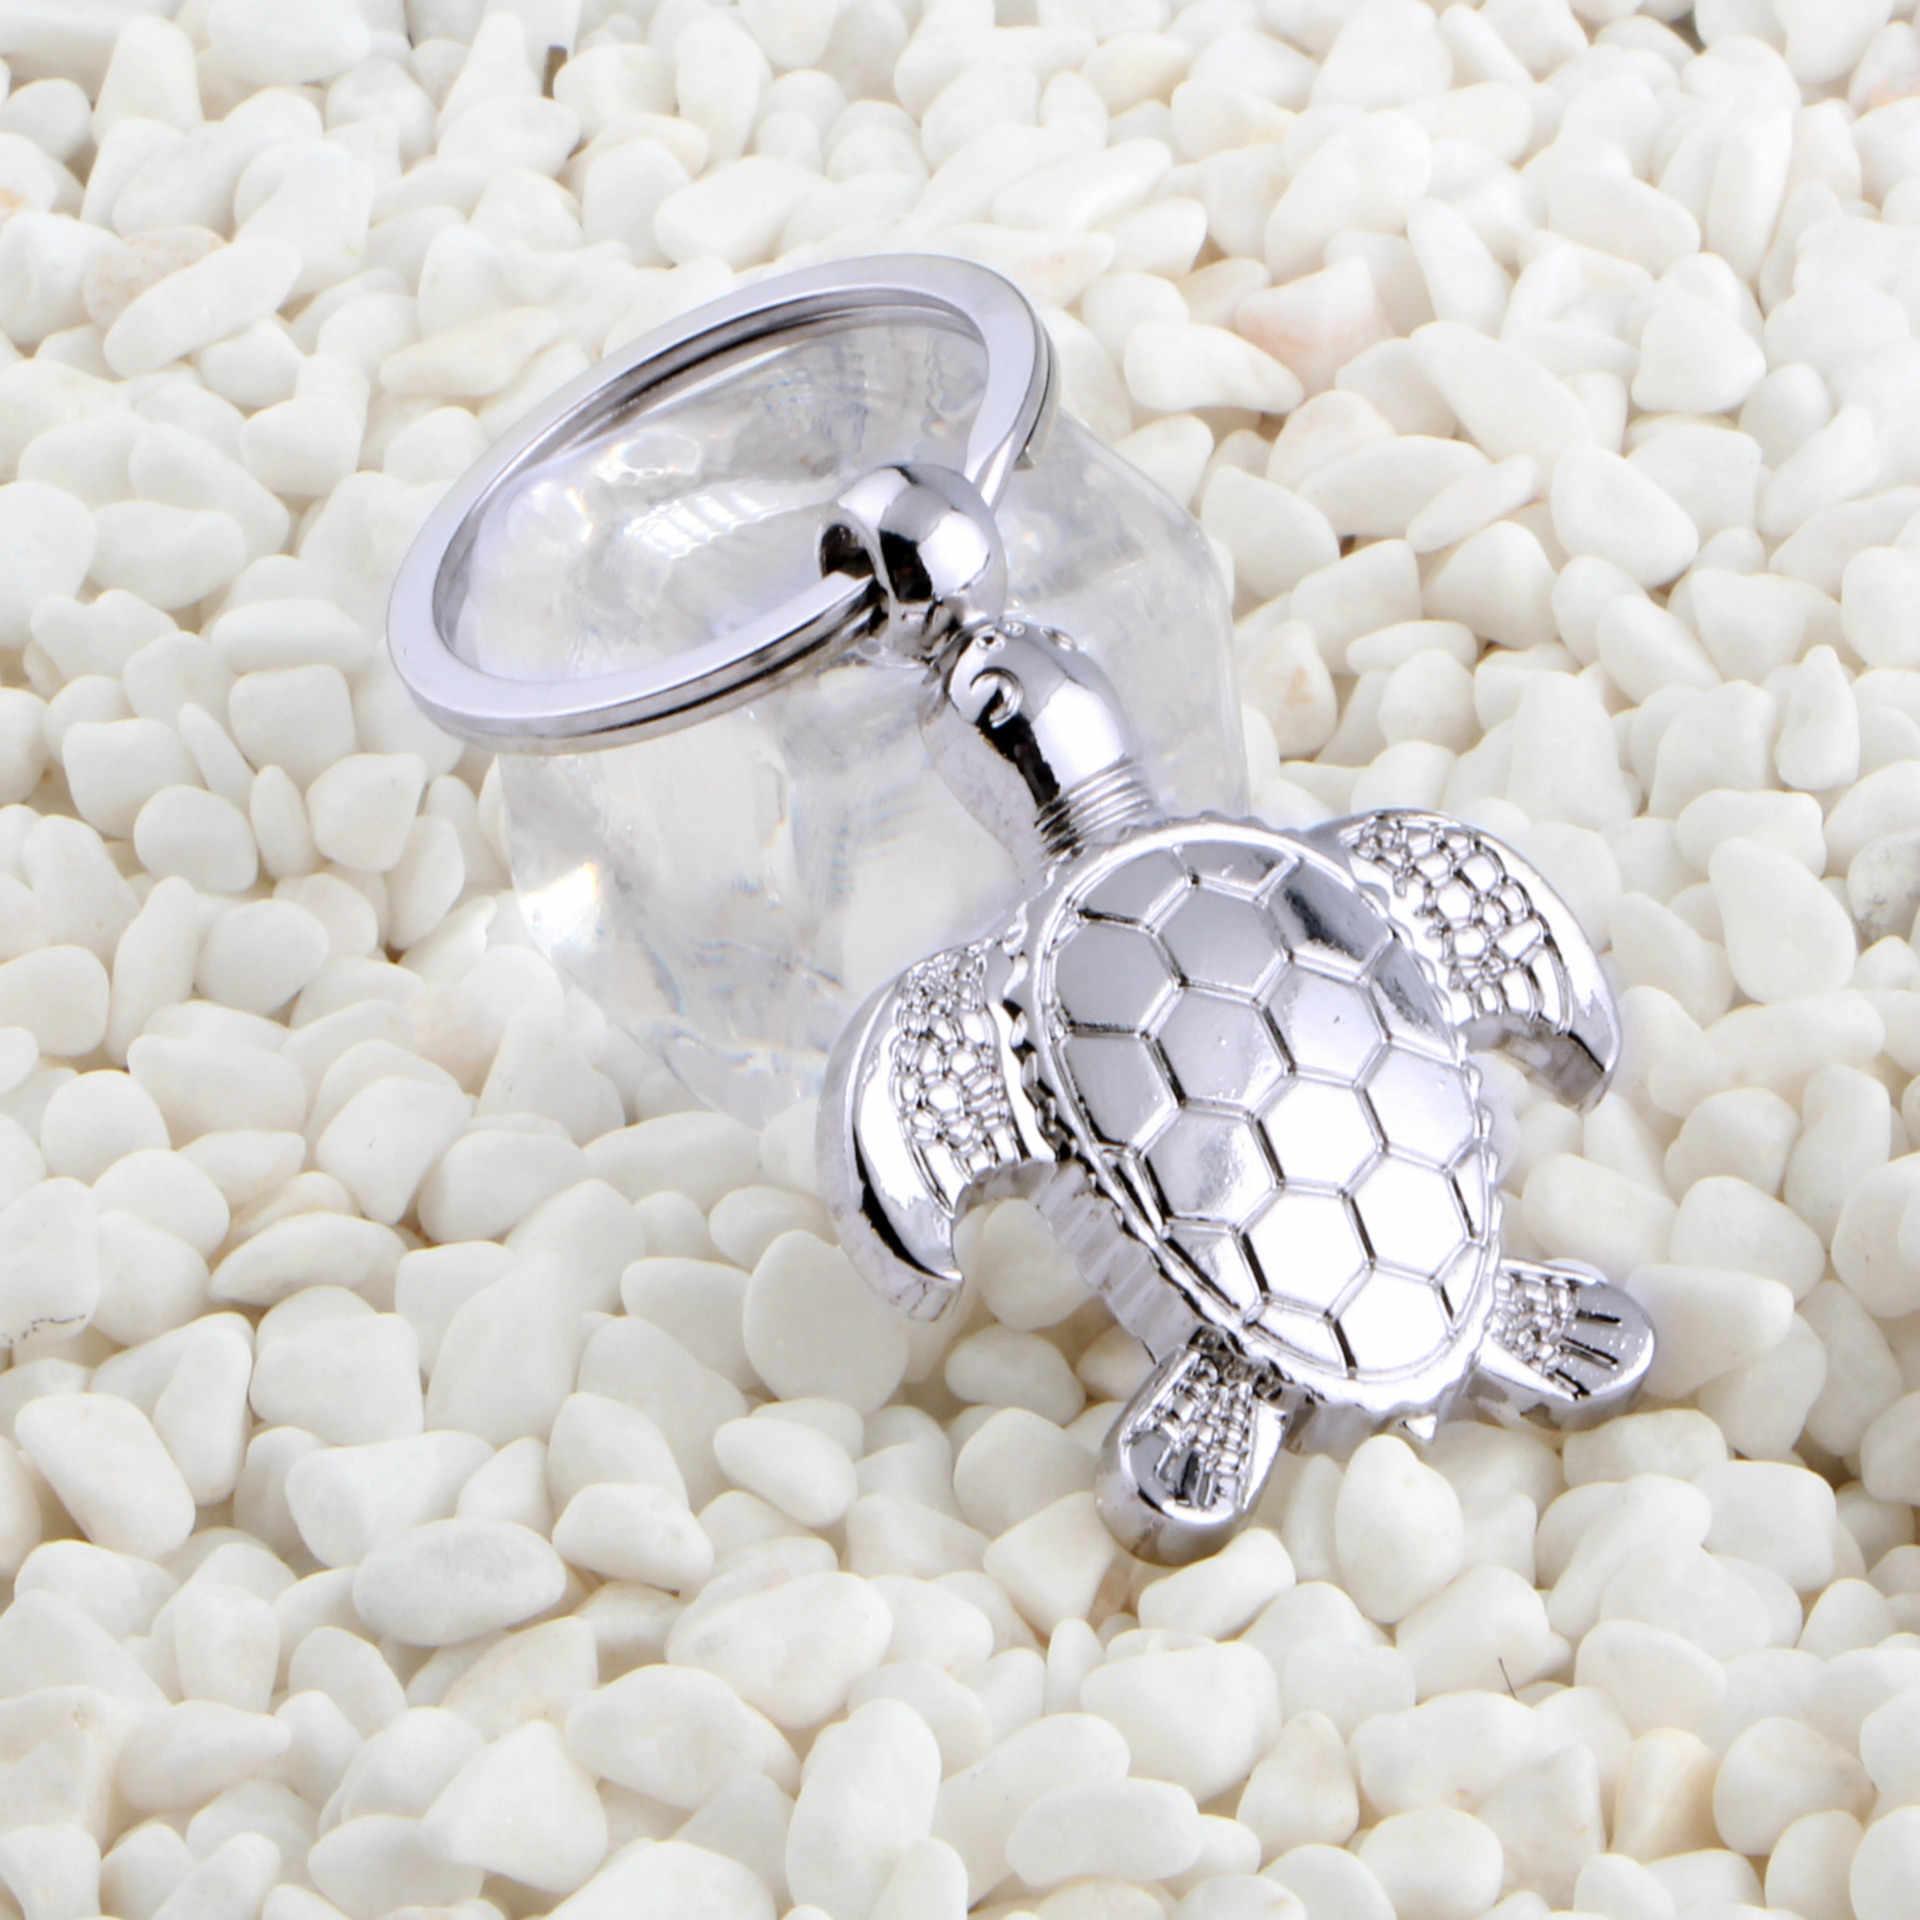 Moda tartaruga chaveiro personalidade animal pingente carro chave titular simulação tartaruga do mar chaveiro saco charme acessórios k1736